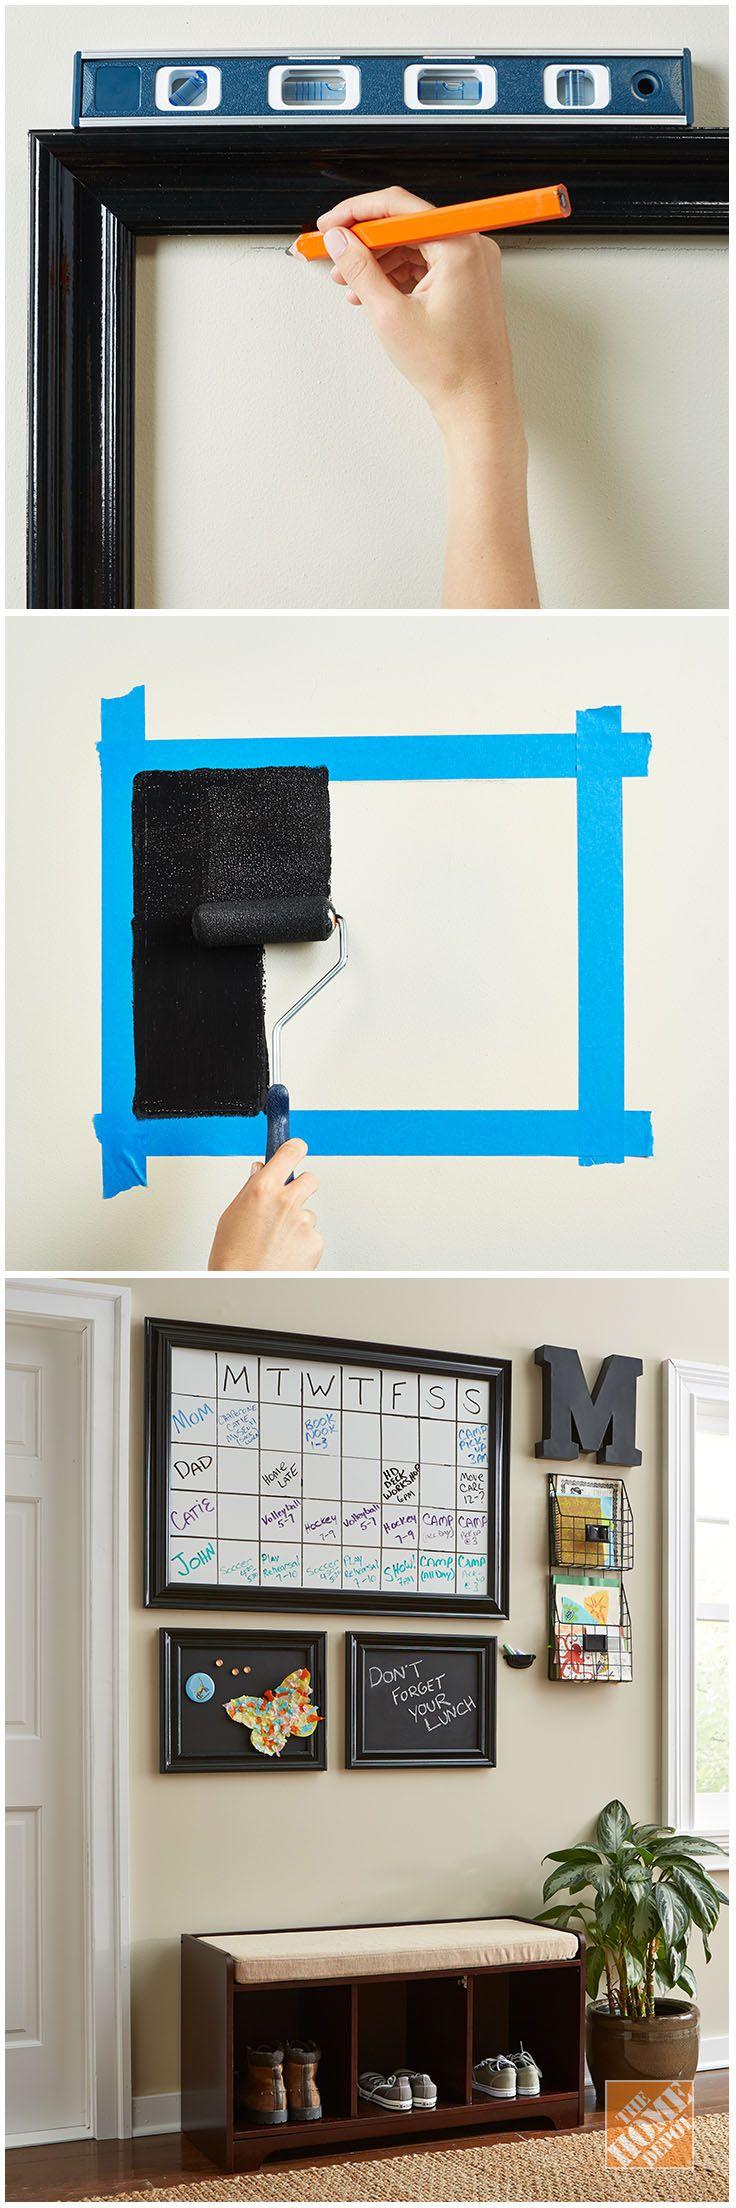 Best 172 The chalkboard project images on Pinterest | Chalk talk ...